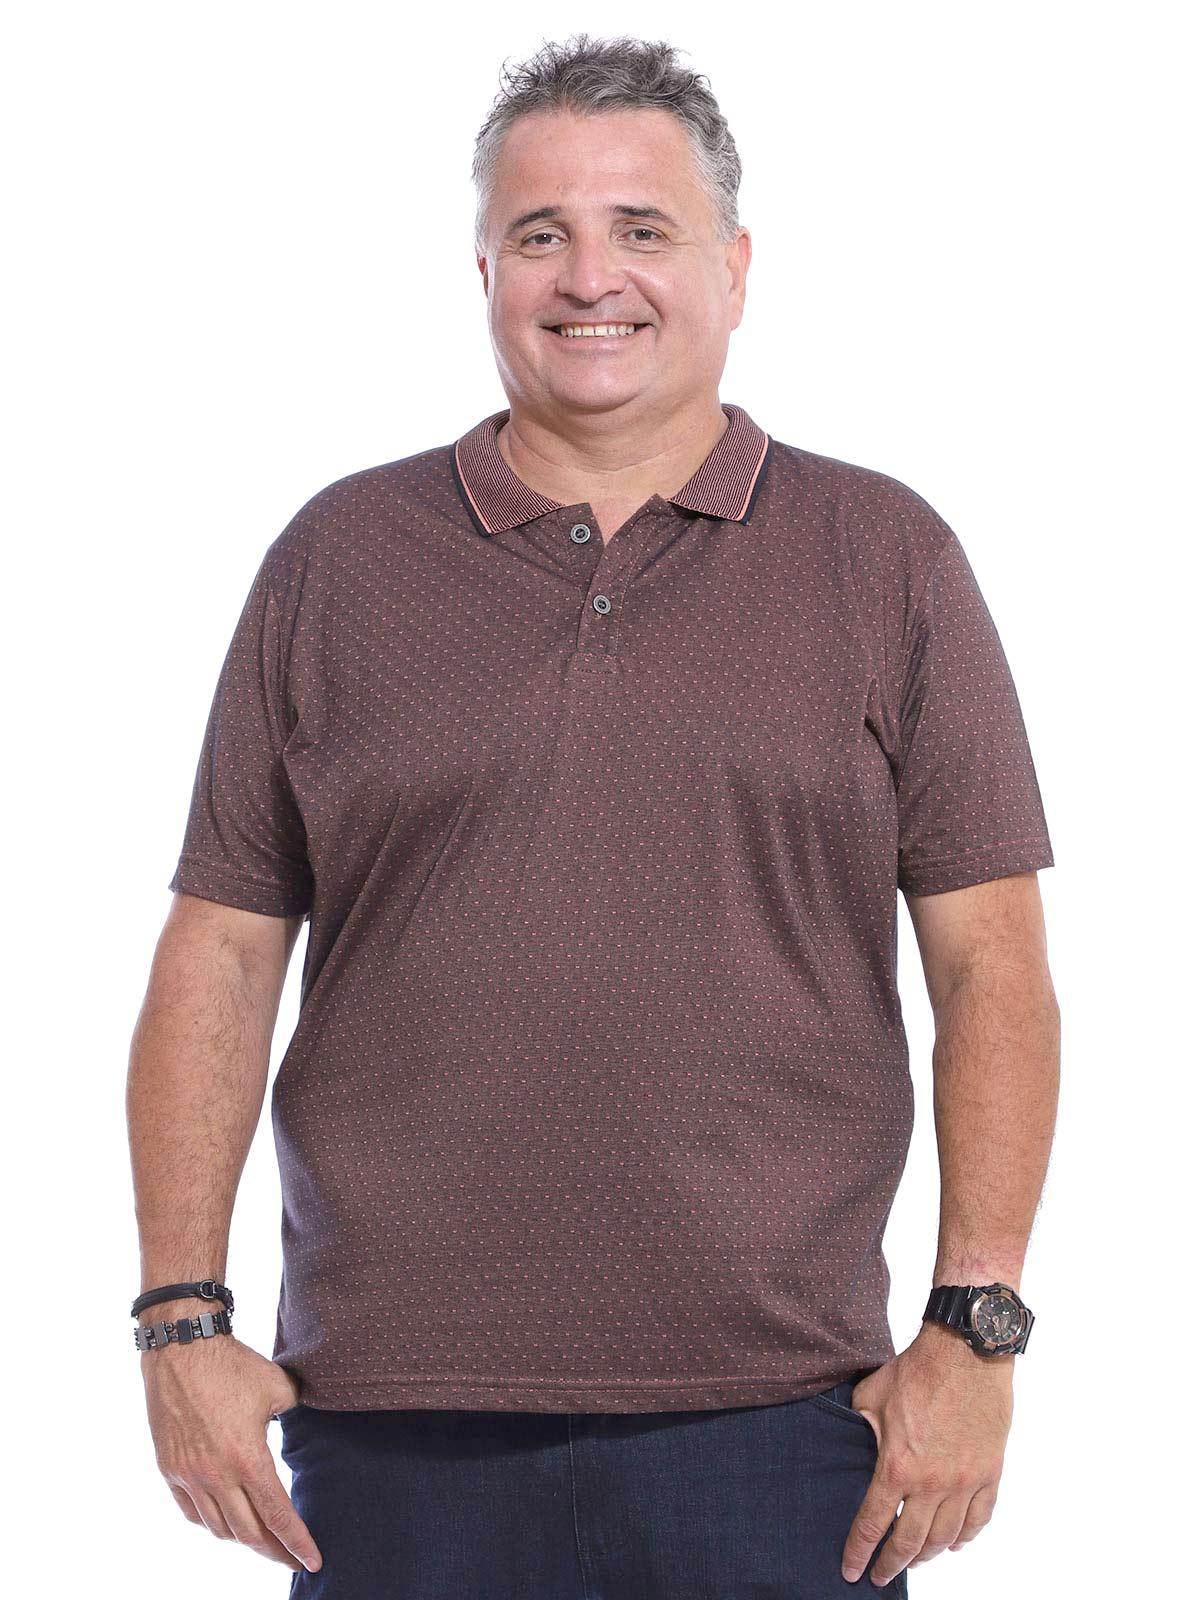 Camisa Polo Plus Size Jacquard Regente - furta cor preto